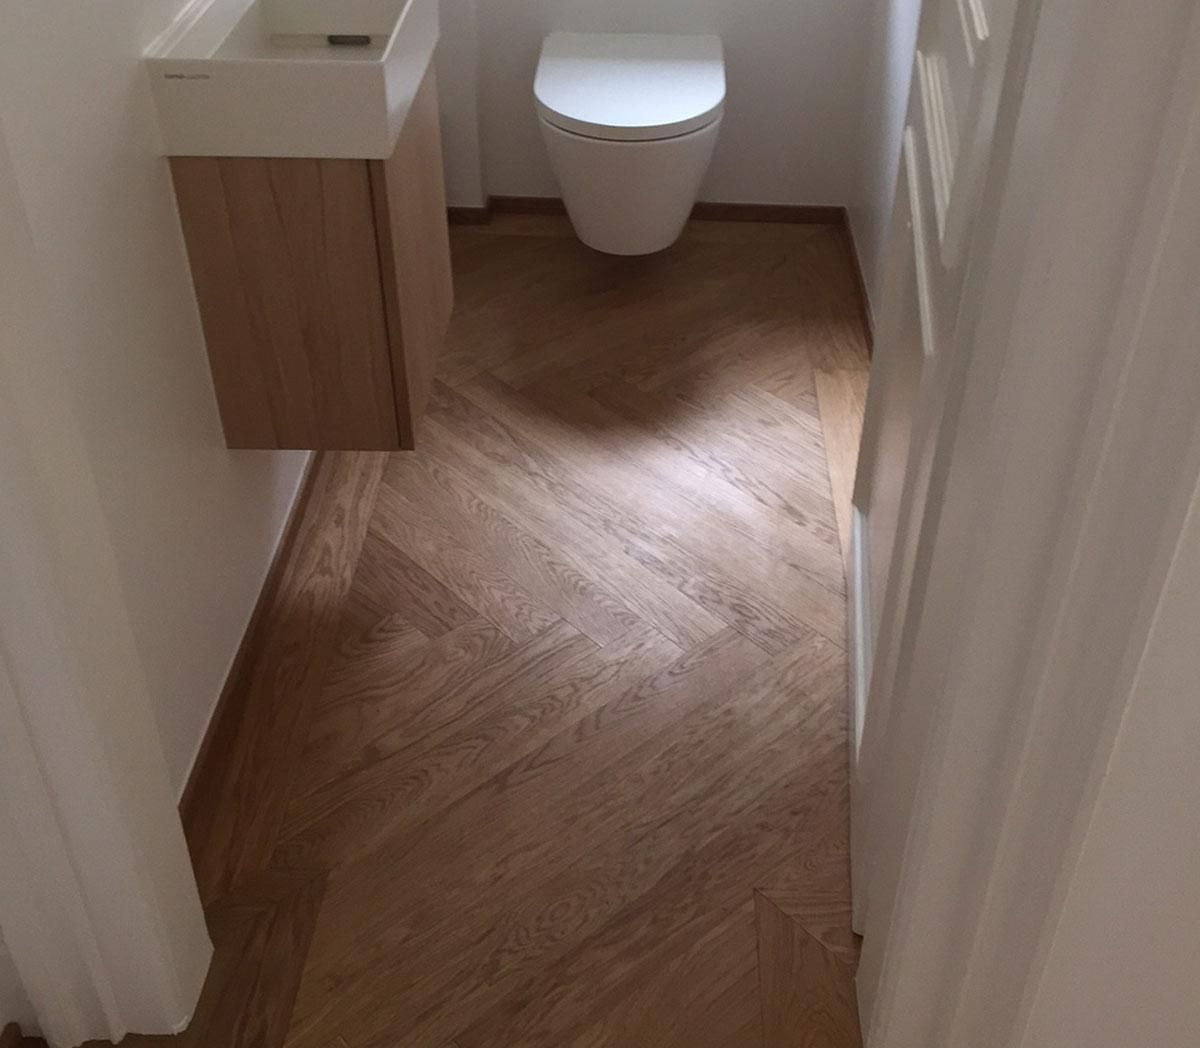 Pvc Holzboden ferrer floors ag parkett bodenbeläge linoleum pvc kautschuk